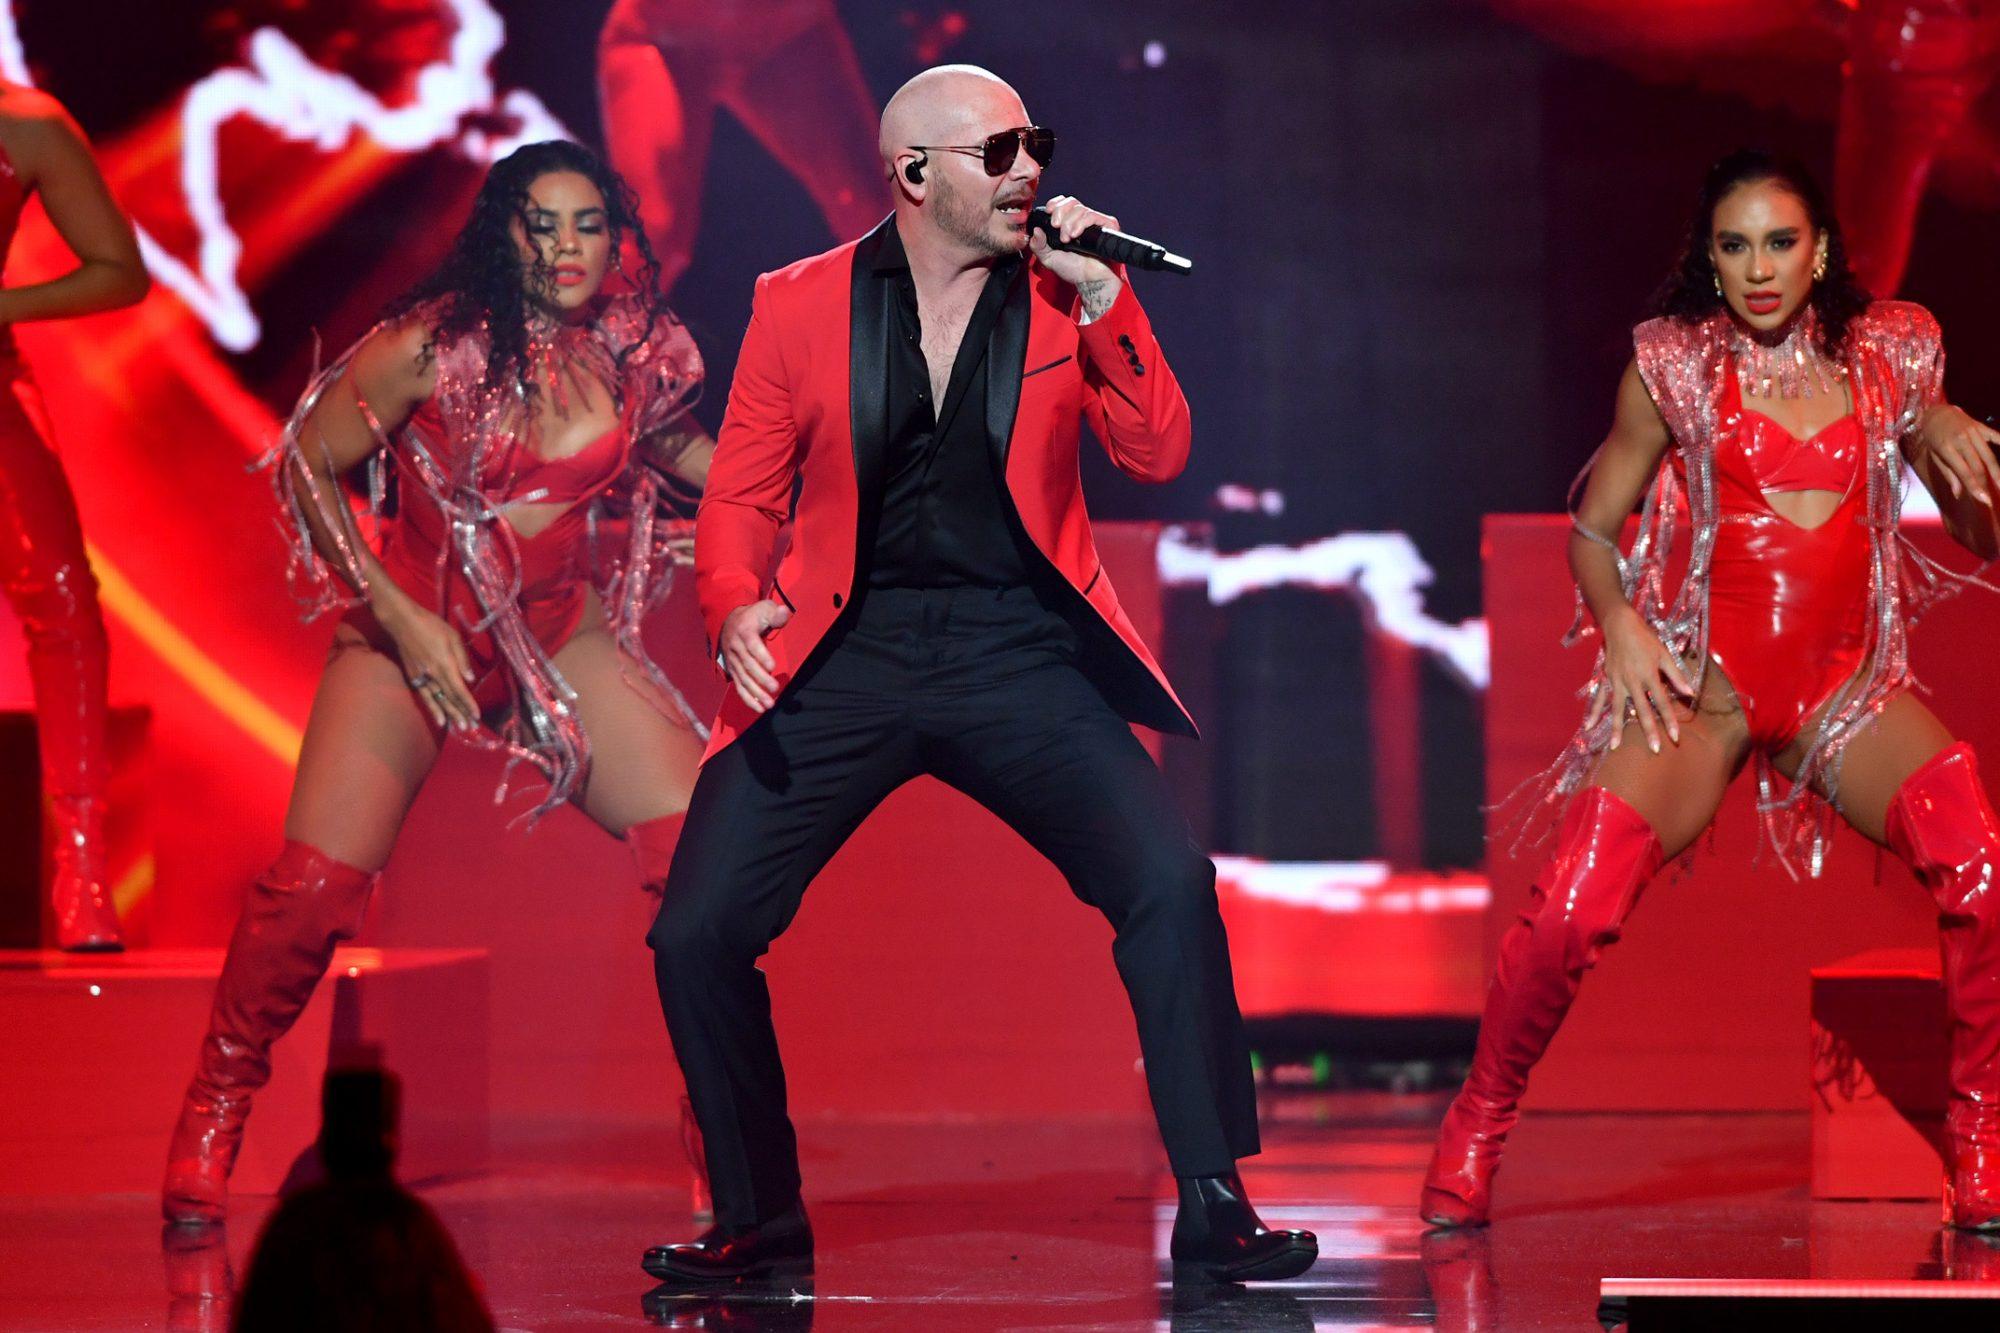 Pitbull performs onstage at Premios Juventud 2021 at Watsco Cente